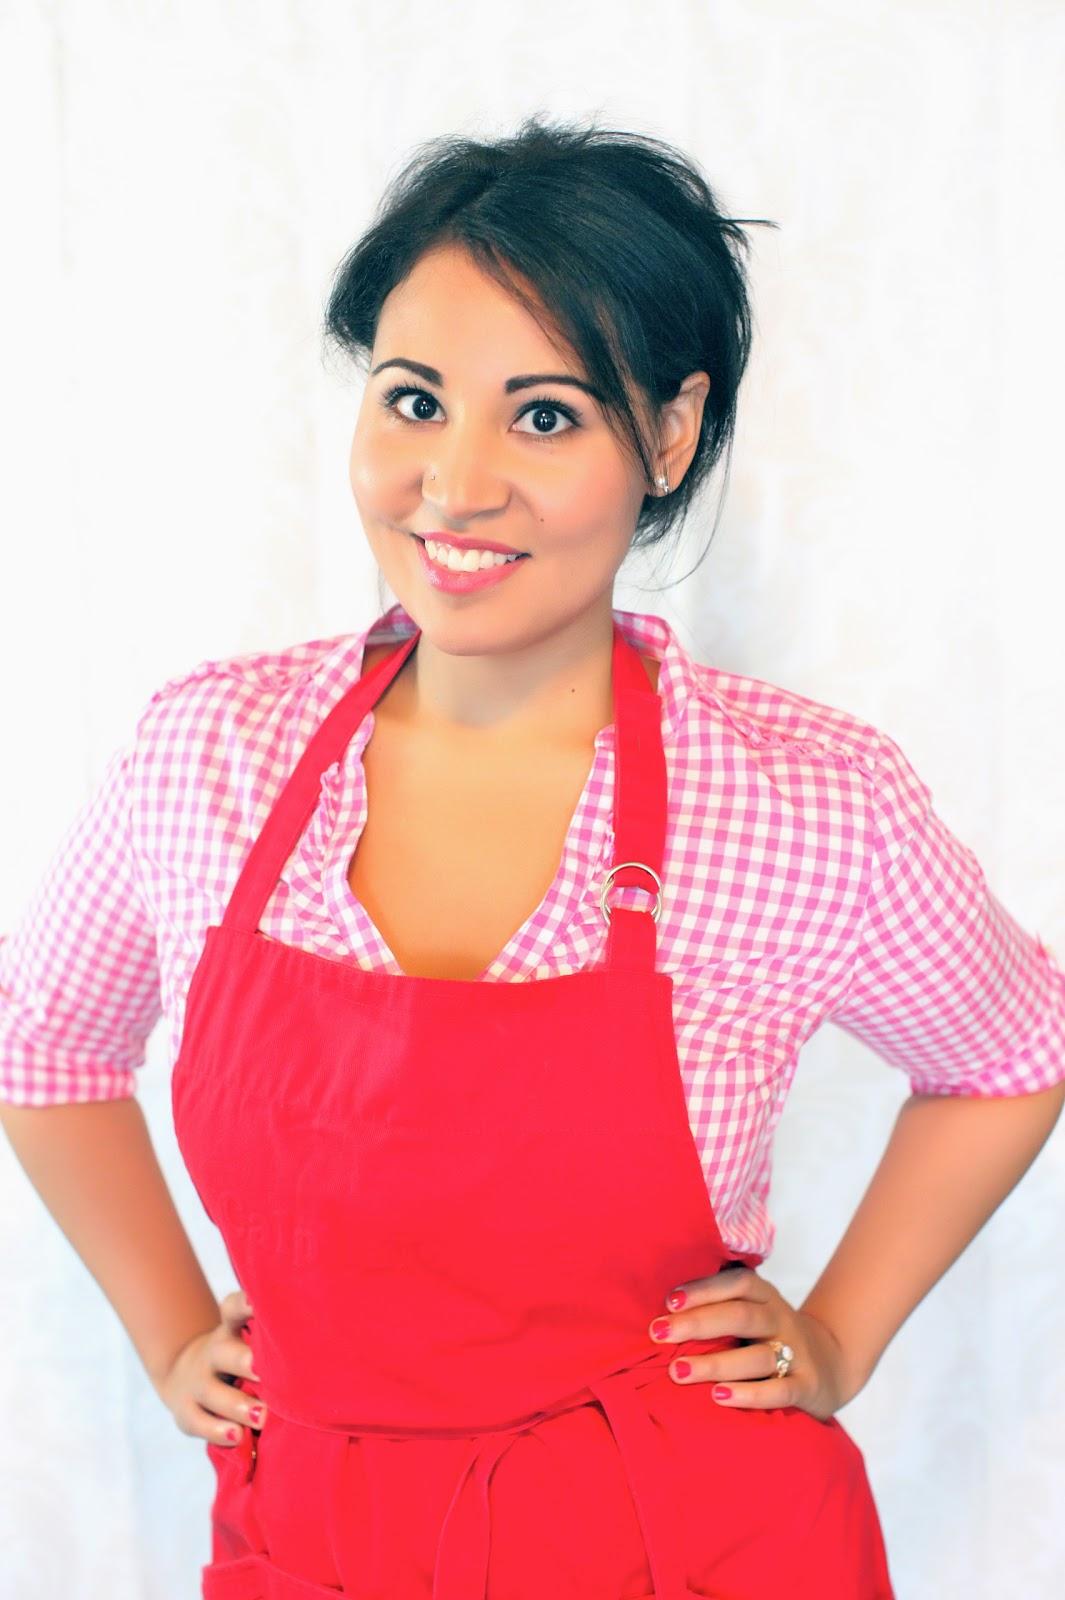 Alejandra ramos culinary lifestyle about alejandra for Alejandra s mexican cuisine